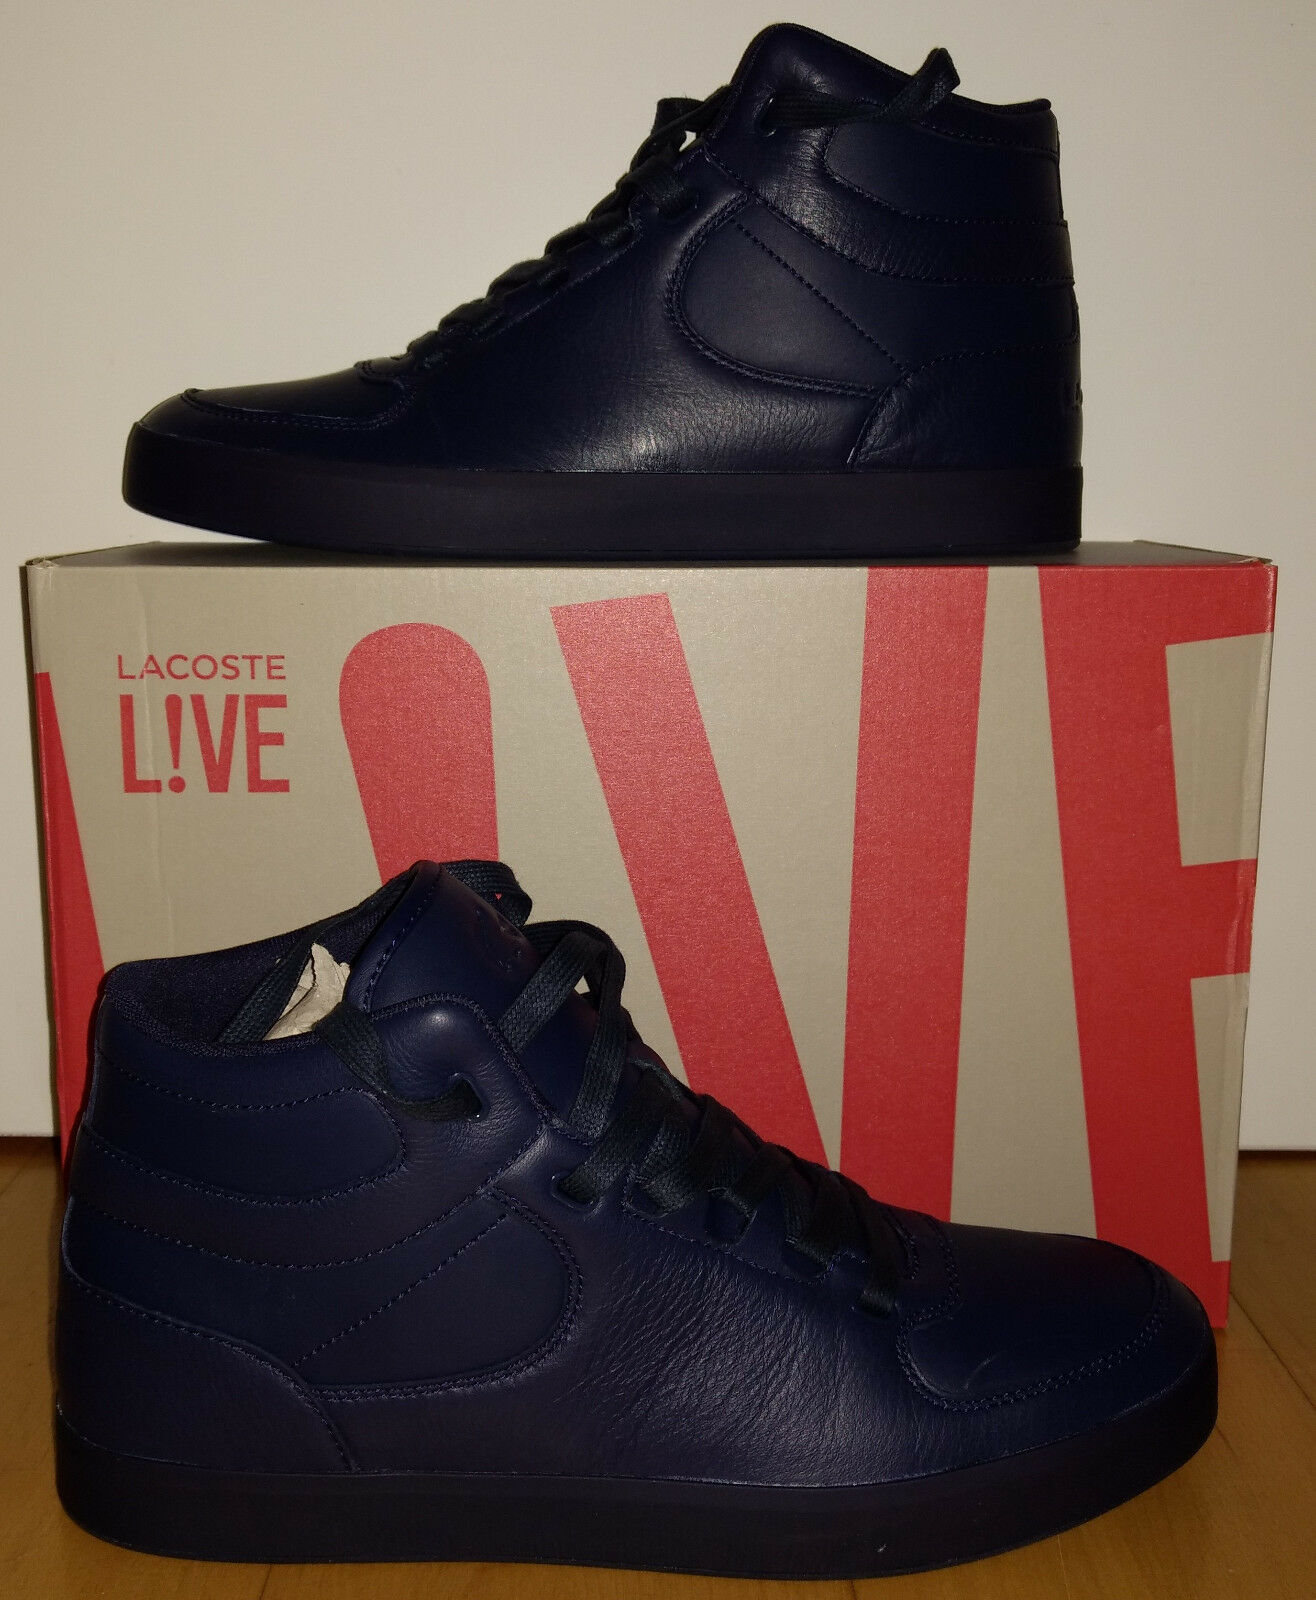 Lacoste Schuhe, Modell: Montantes Vedren, blau, EUR: 44, ungetragen, neu in OVP!